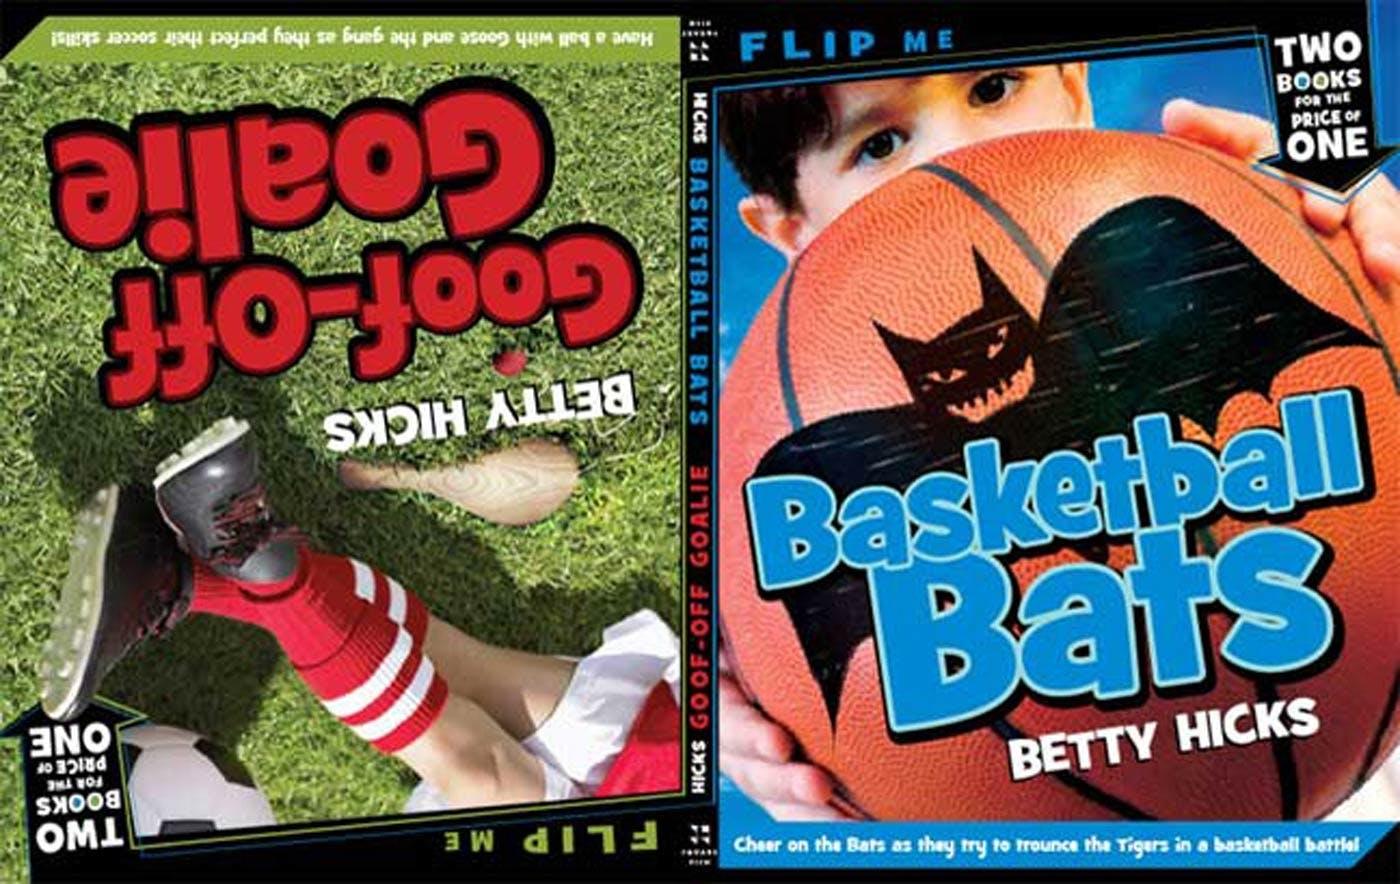 Image of Basketball Bats / Goof-Off Goalie